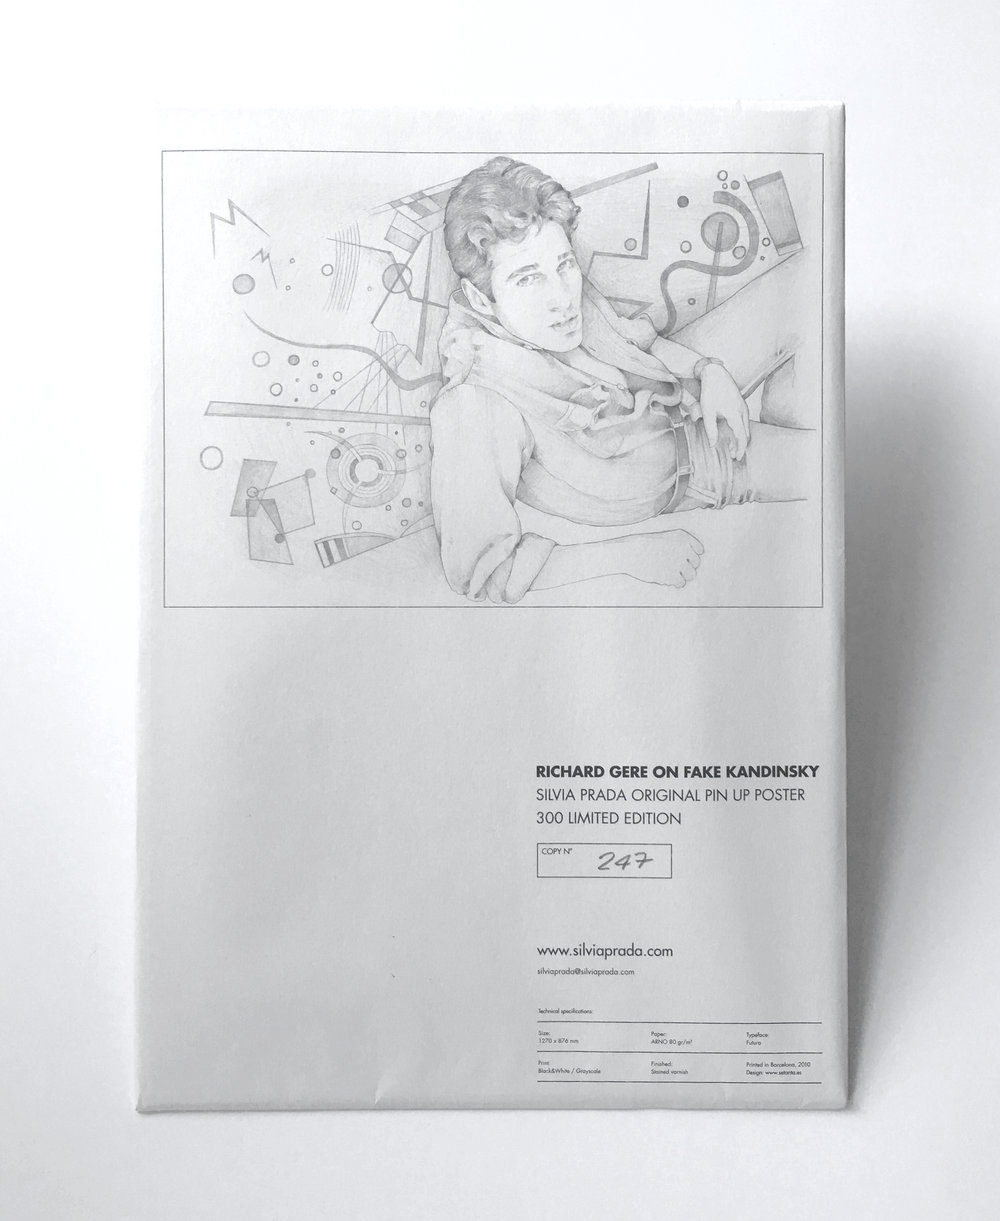 Richard Gere on Fake Kandinsky Pin-Up Poster